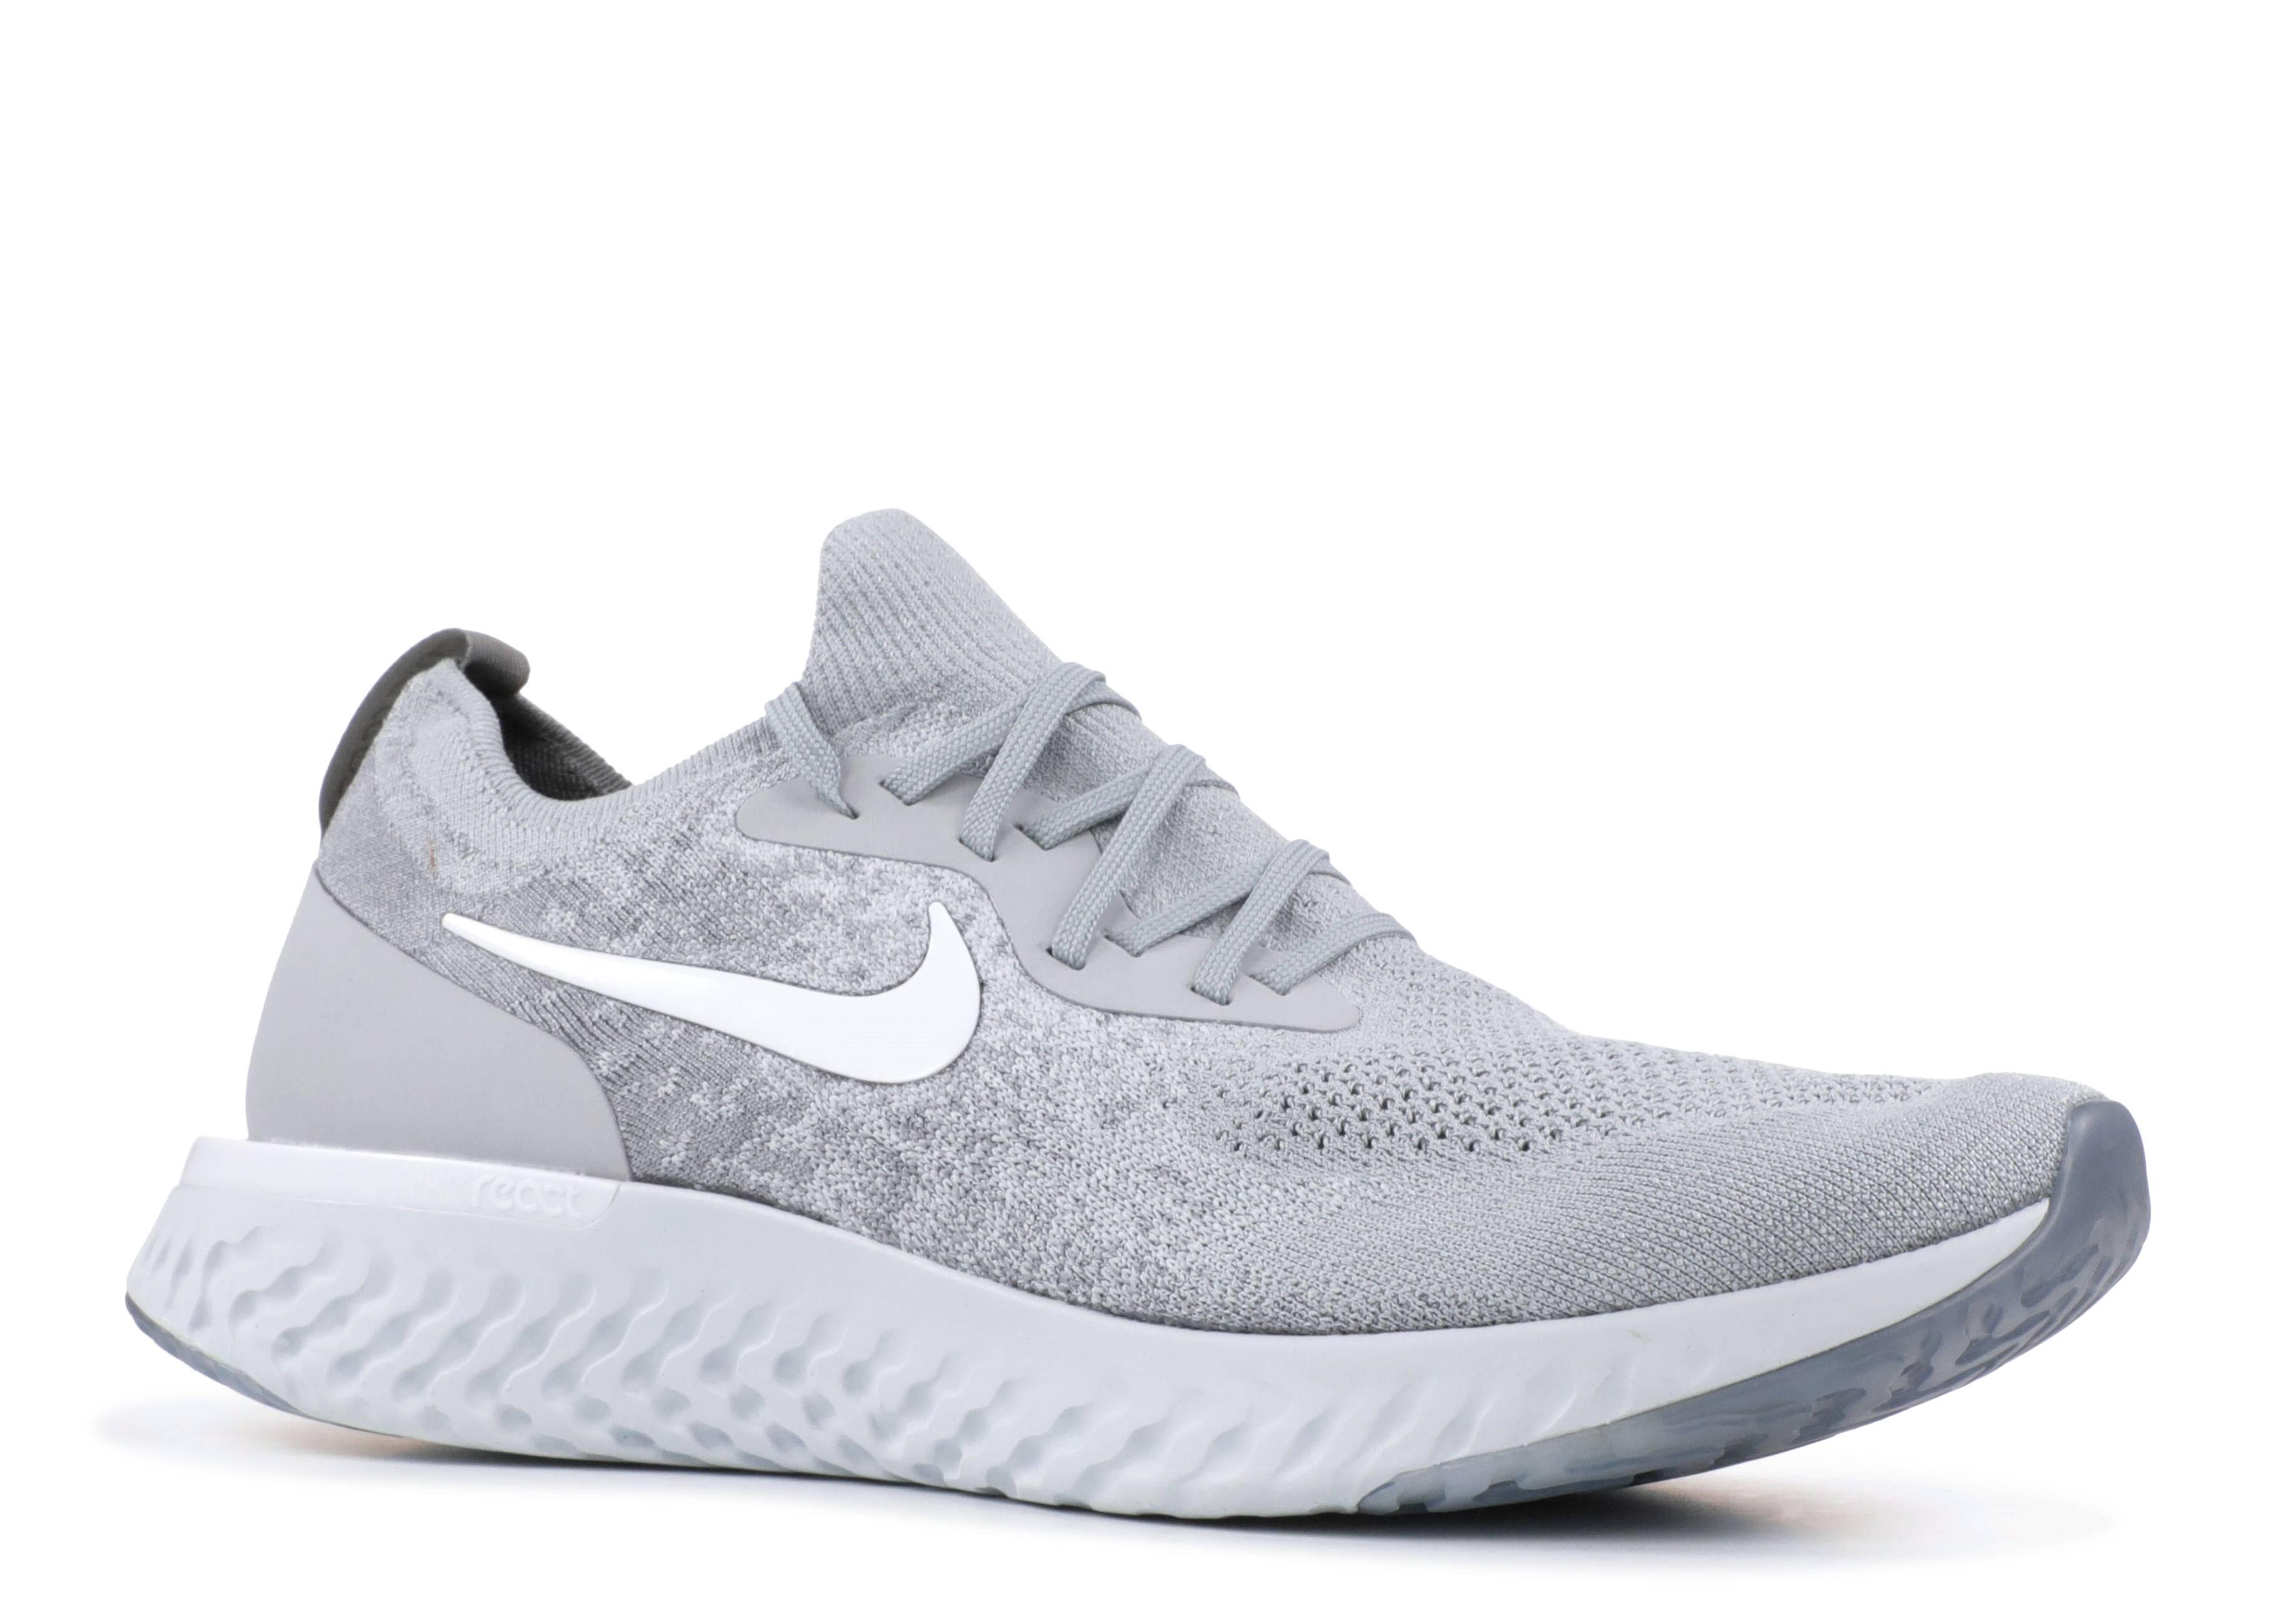 000d7fa3f3a Nike Epic React Flyknit - Nike - aq0067 002 - wolf grey white-cool grey